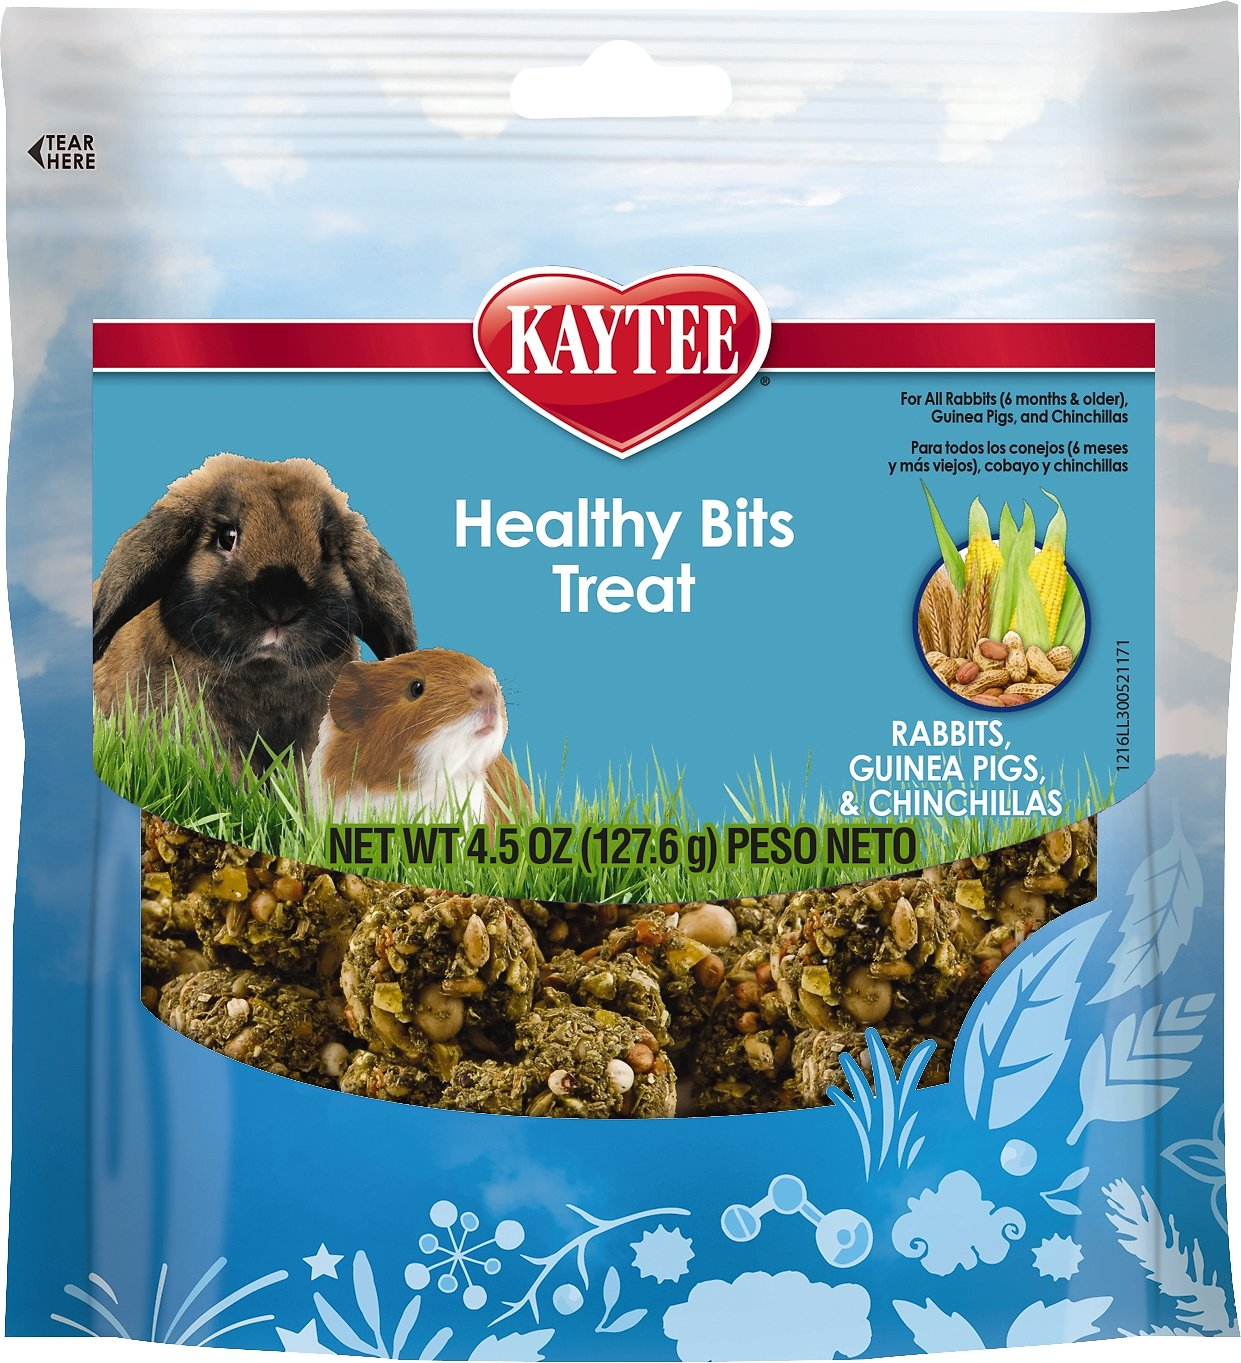 Kaytee Forti-Diet Pro Health Healthy Bits Rabbit, Guinea Pig & Chinchilla Treats, 4.5-oz bag